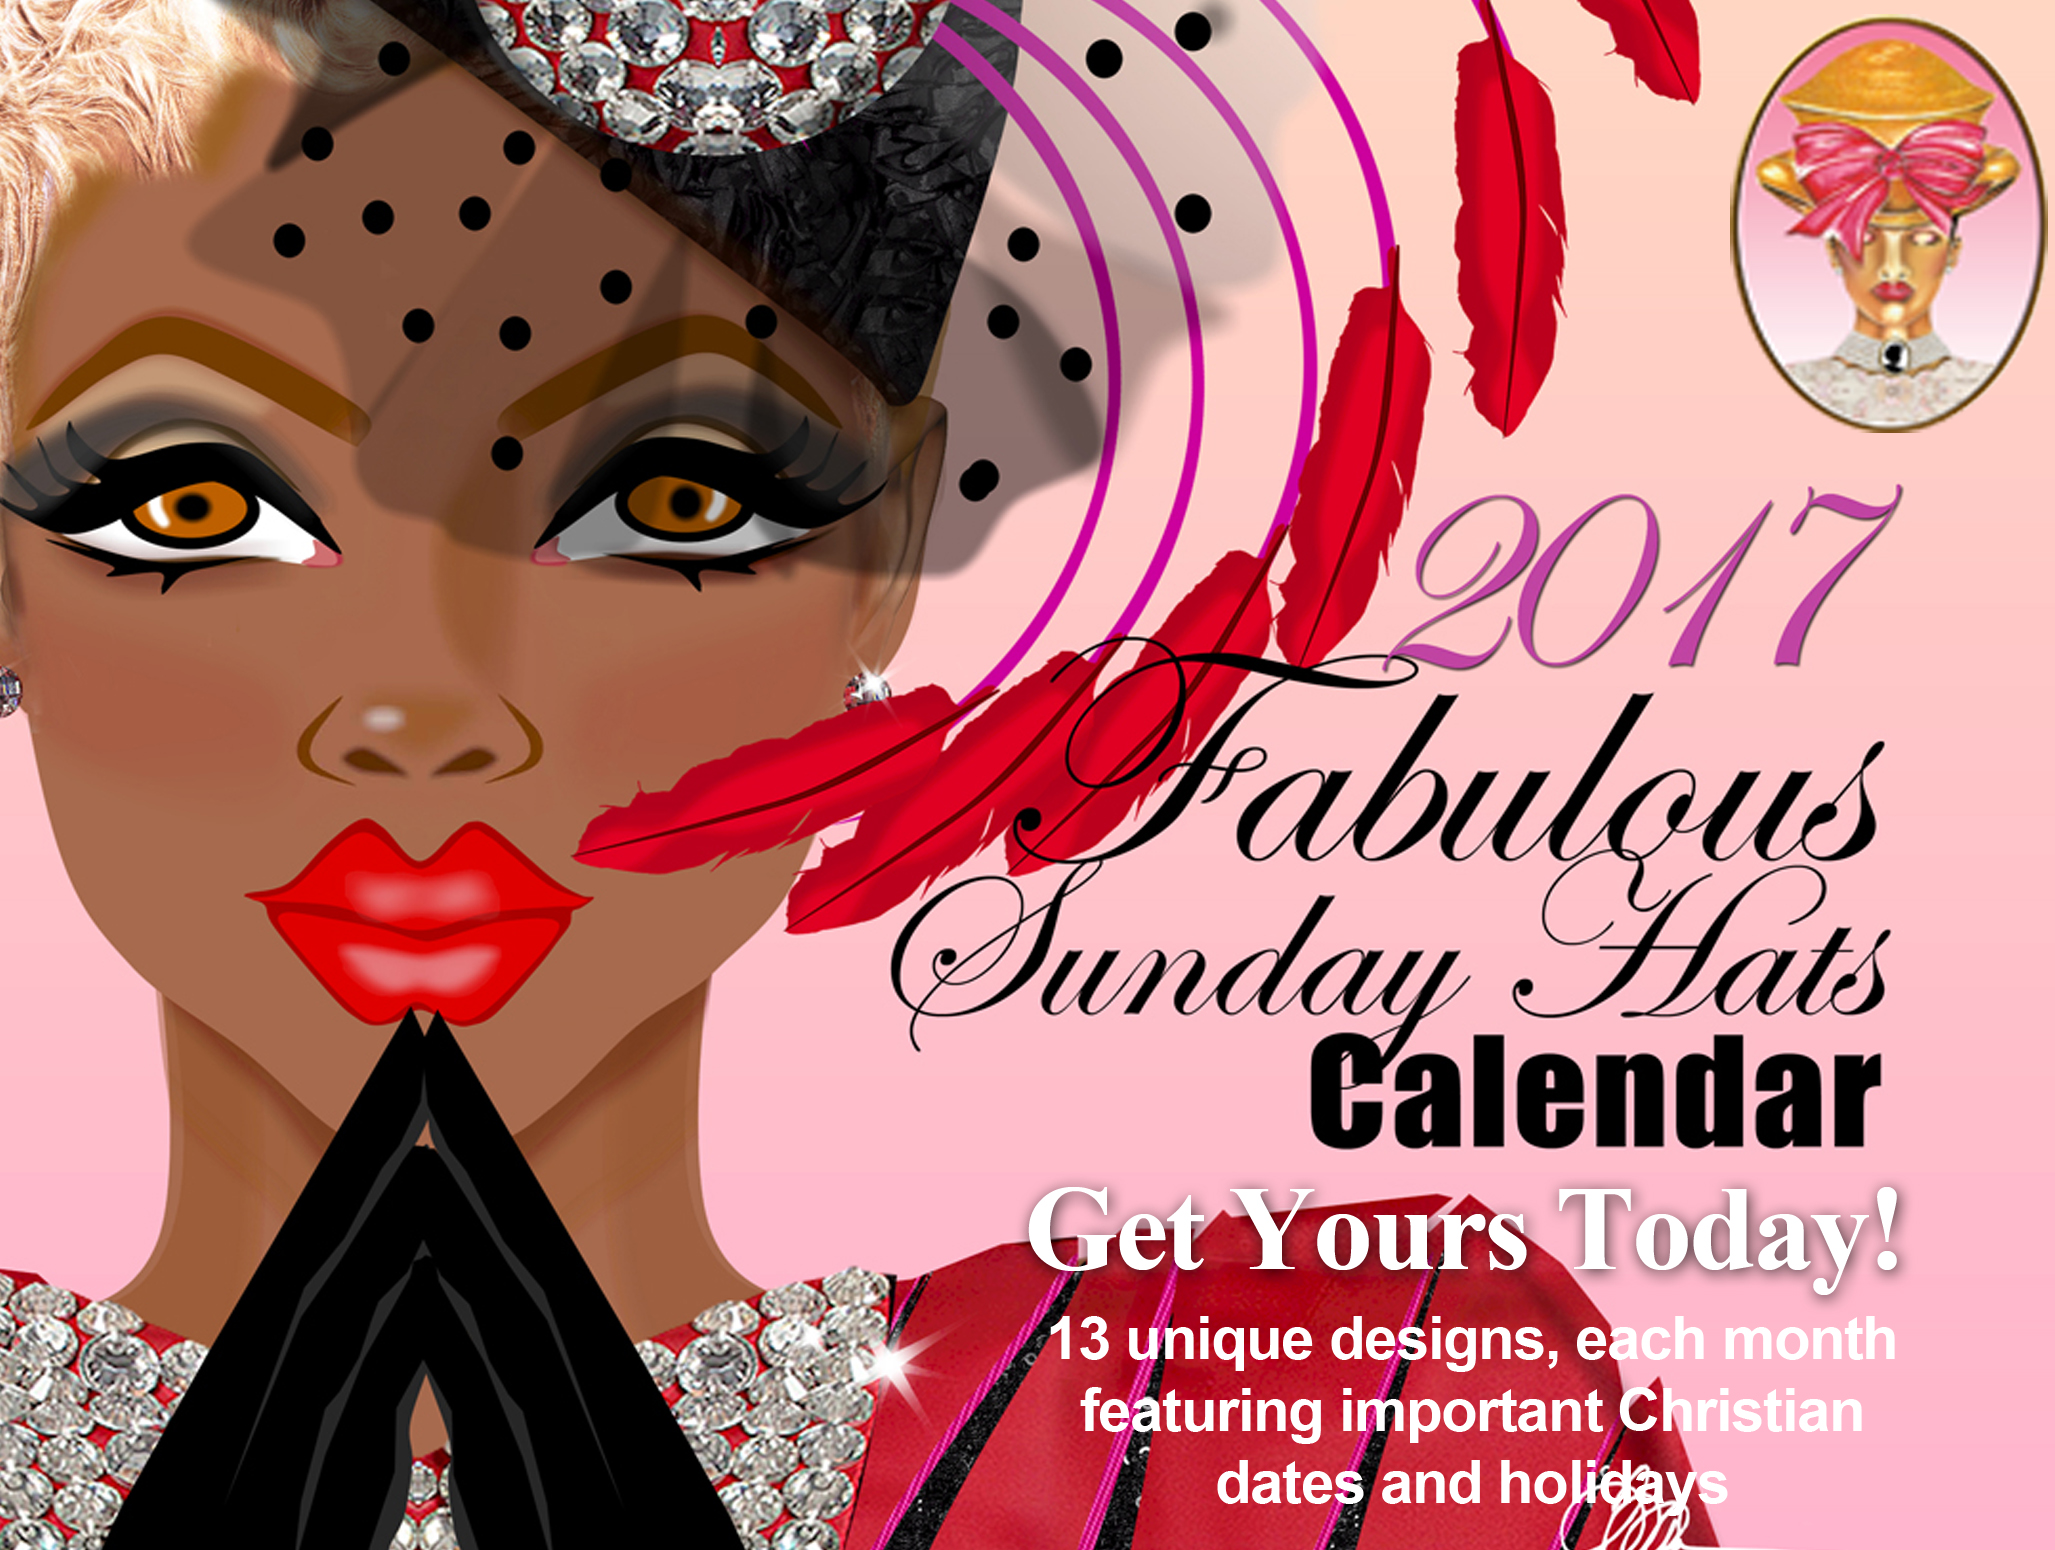 SMS 2017 Wall Calendar